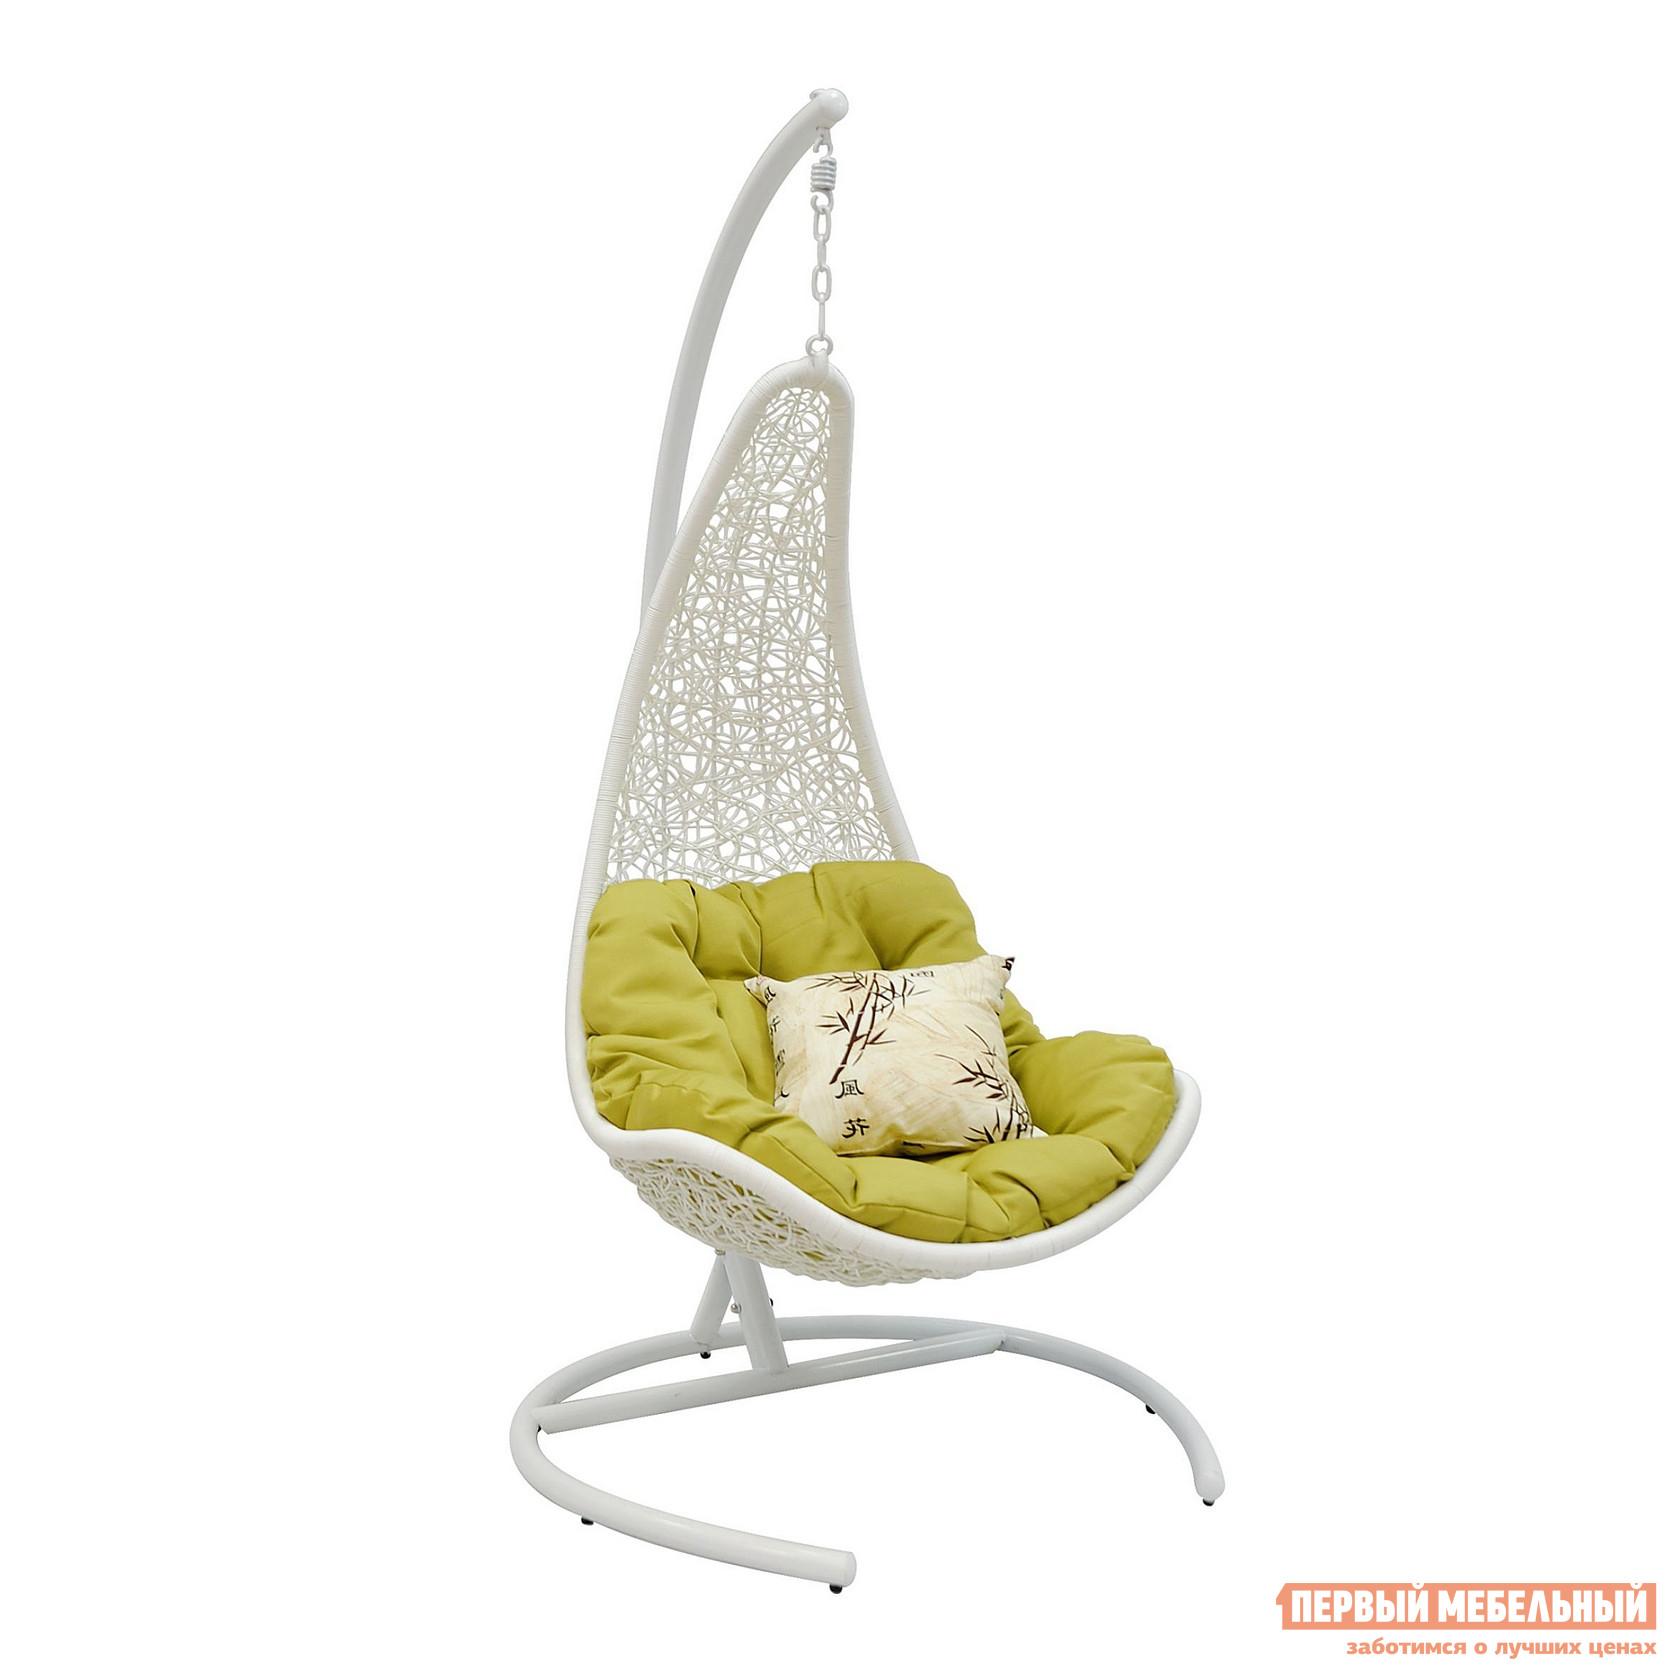 Подвесное кресло ЭкоДизайн Wind White emmababy summer newborn infant baby girl ruffles sleeveless romper flamingo jumpsuit sunsuit clothes outfits baby clothing